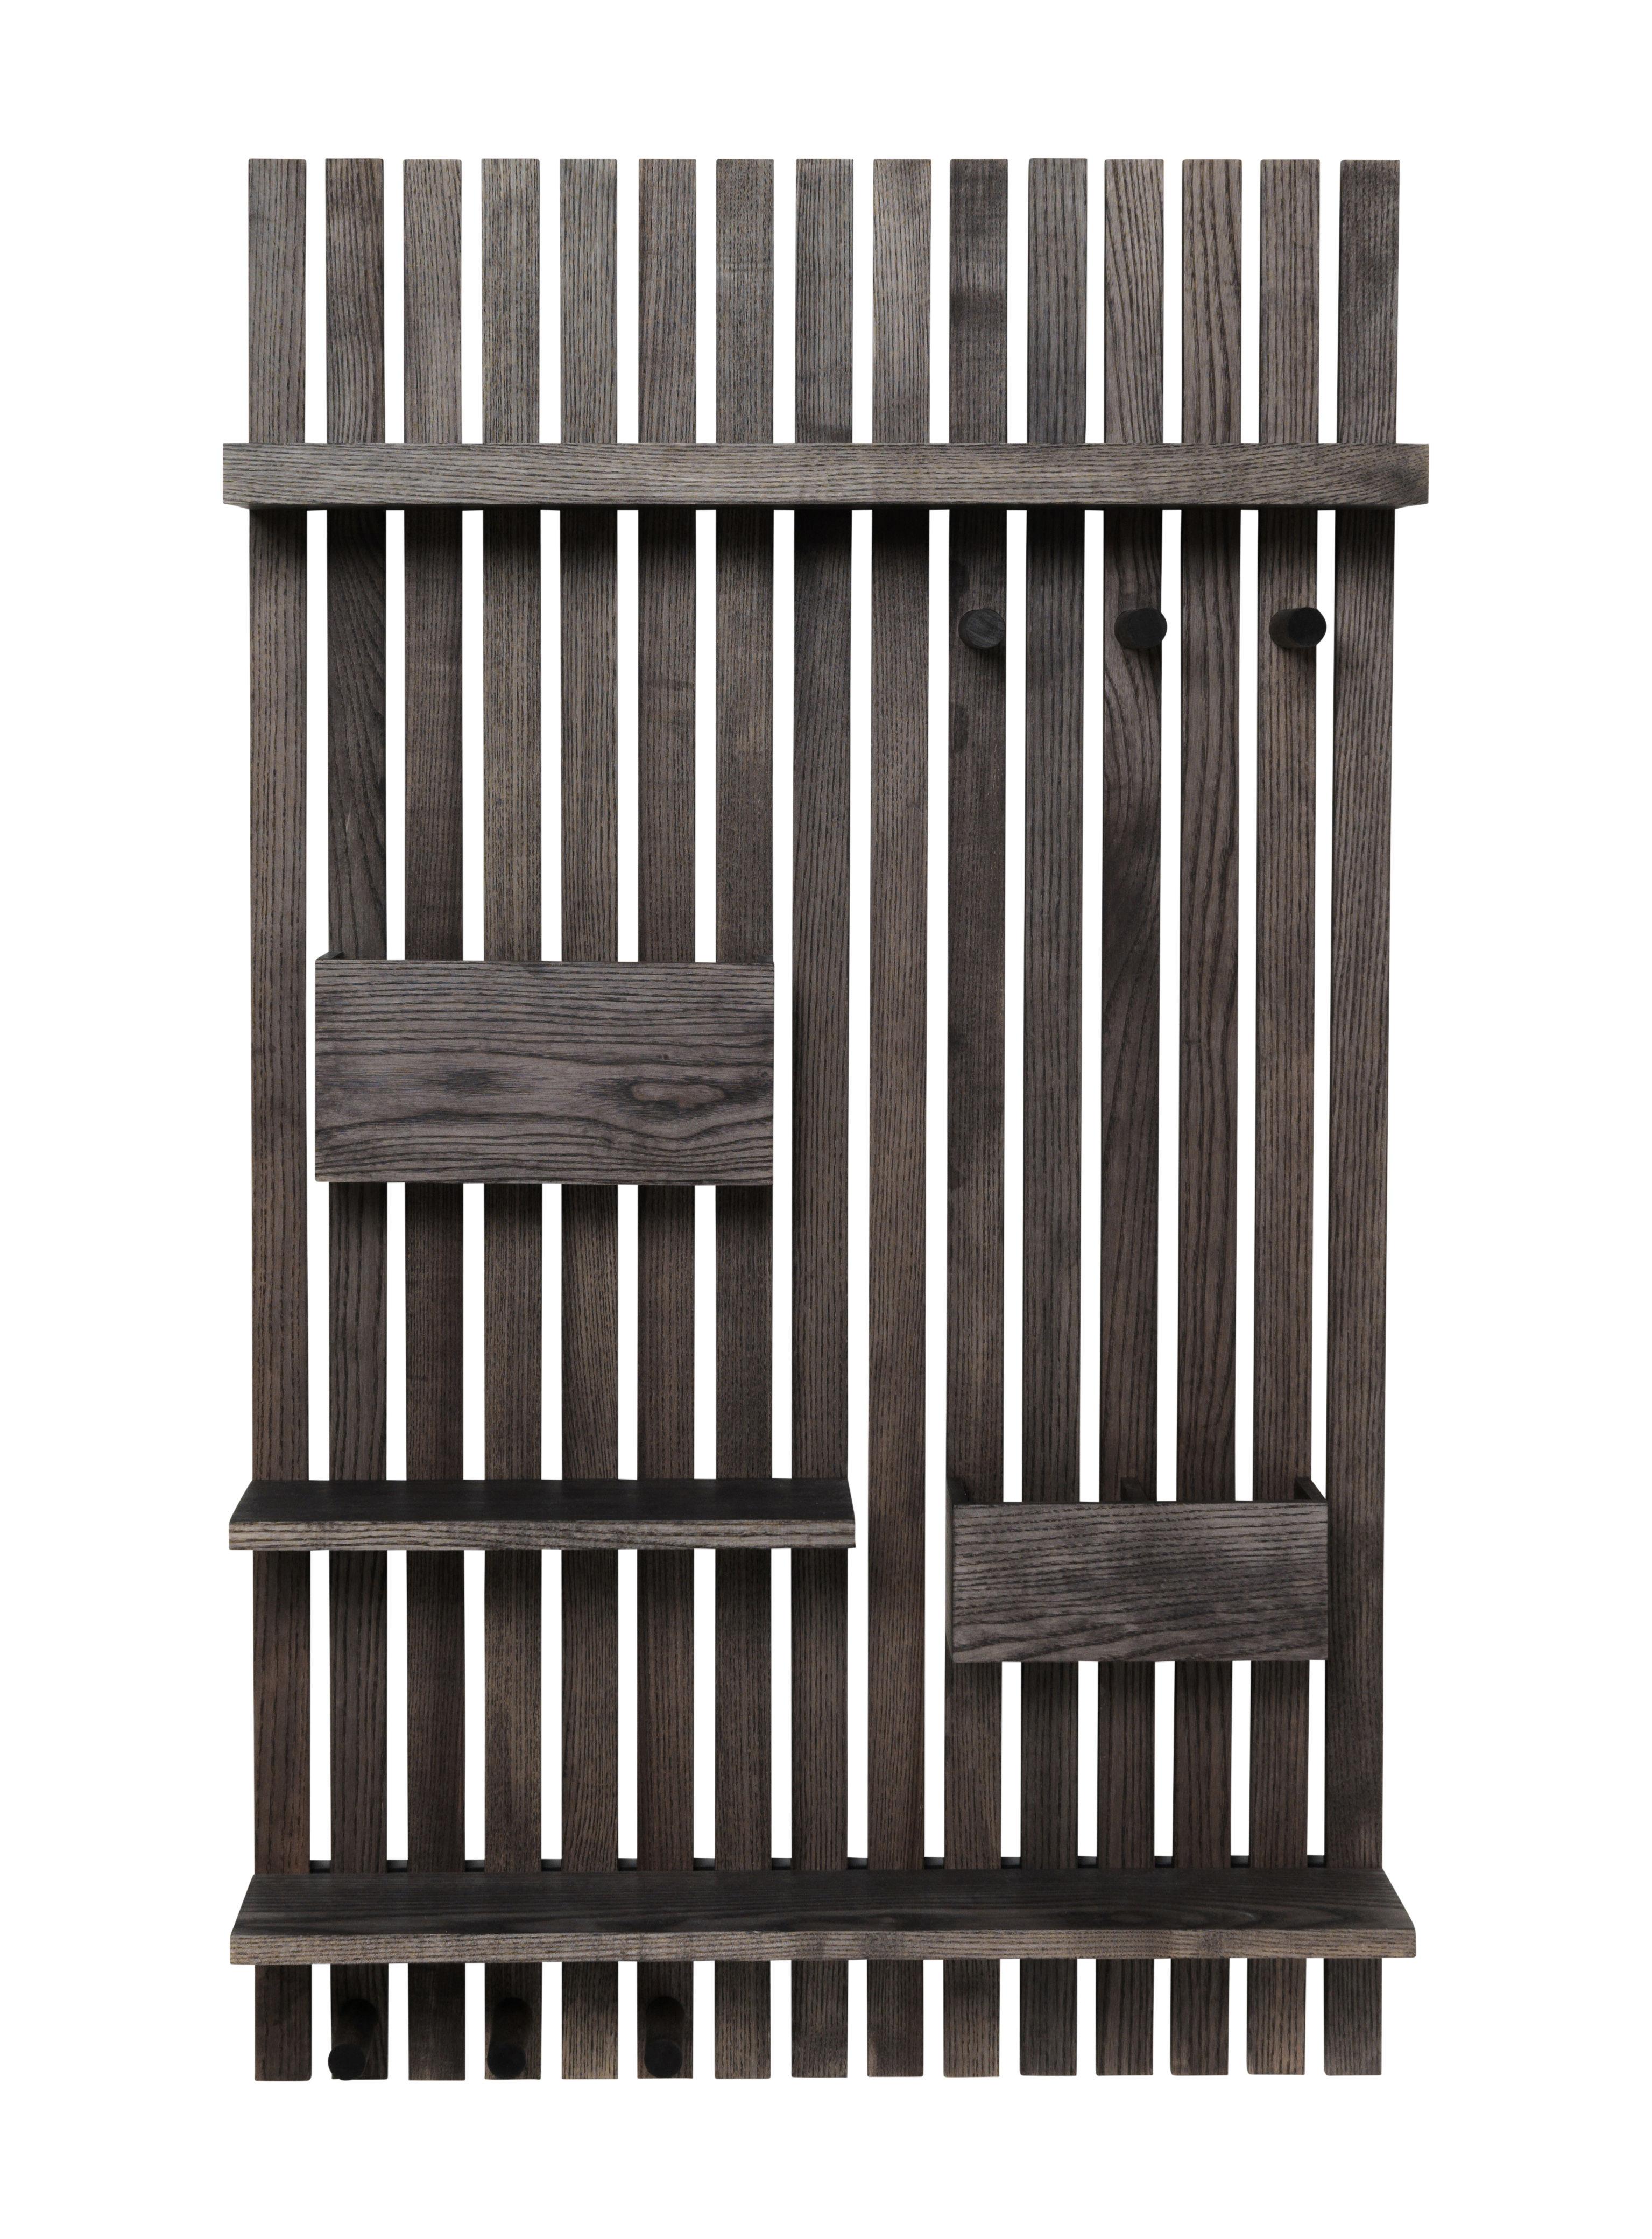 Mobilier - Meubles de rangement - Rangement mural Wooden / L 59 x H 99,7 cm - Frêne - Ferm Living - Frêne noir - Frêne teinté noir